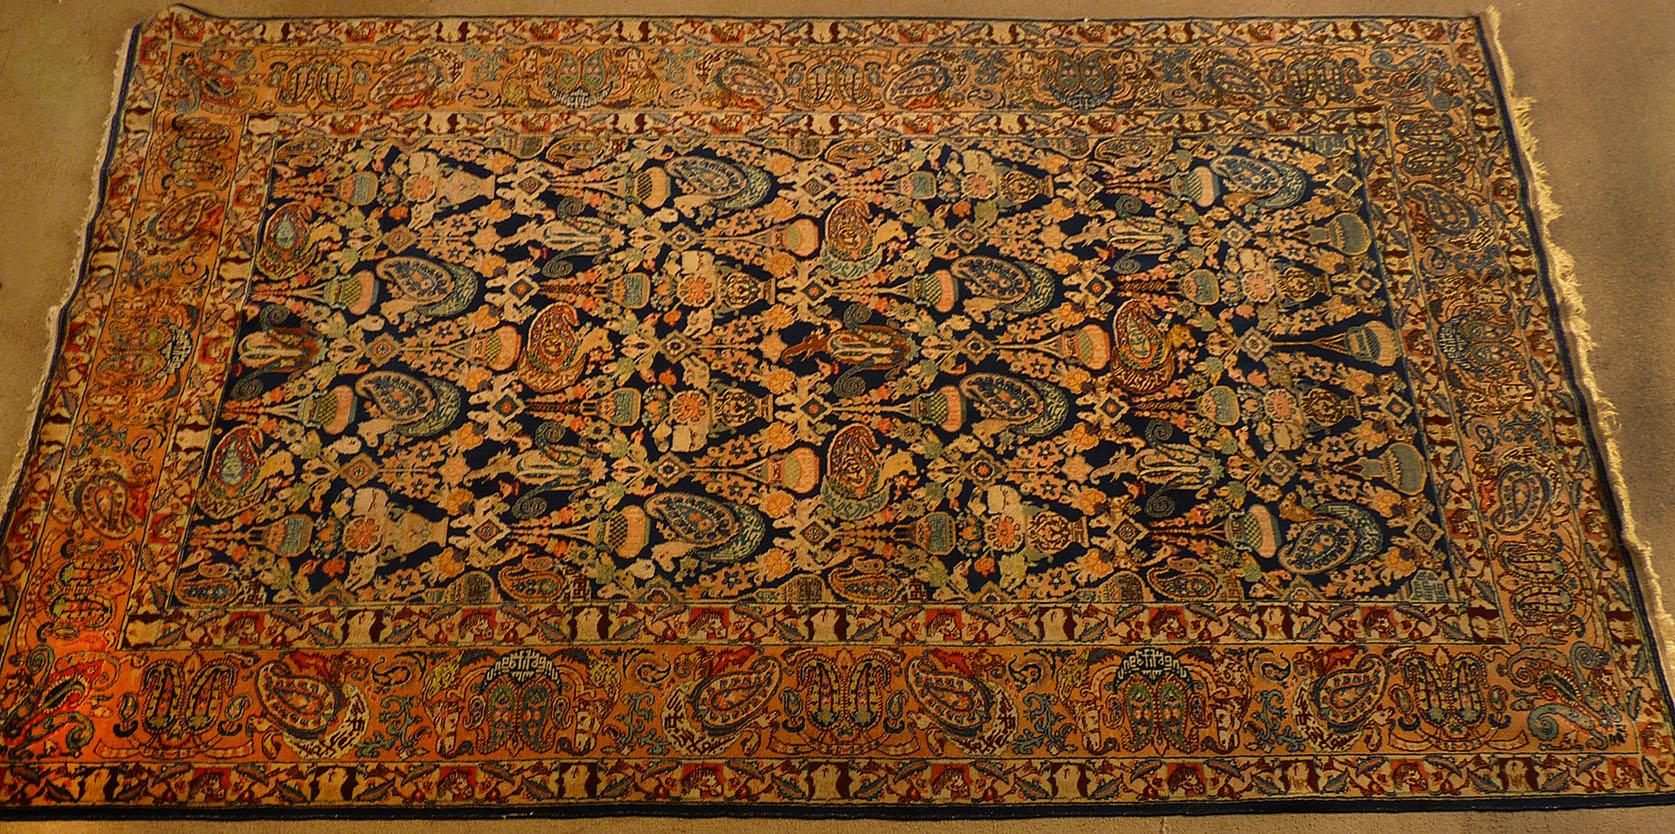 Bgw remate i0000 alfombra gek htm gendata for Alfombra persa azul